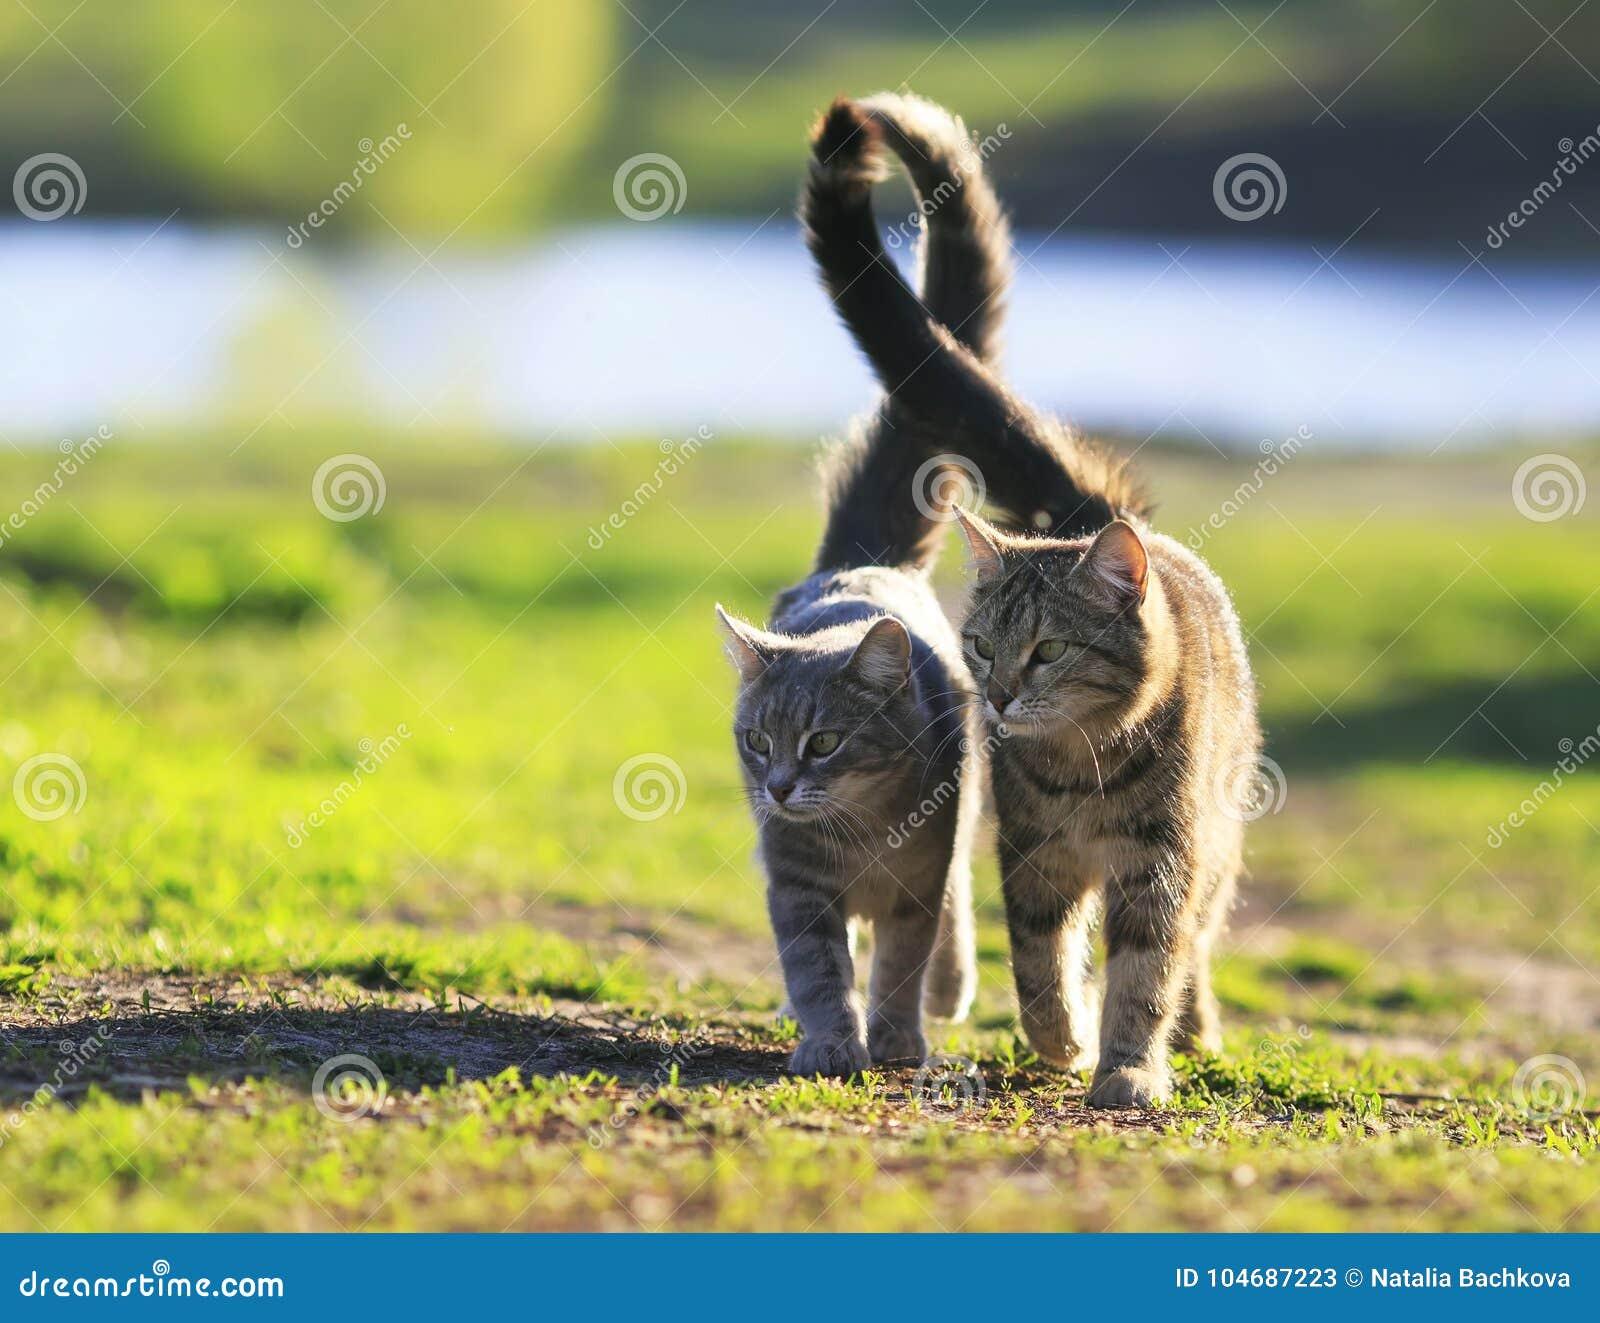 Любовники соединяют striped прогулку котов совместно на зеленом луге в Sunn